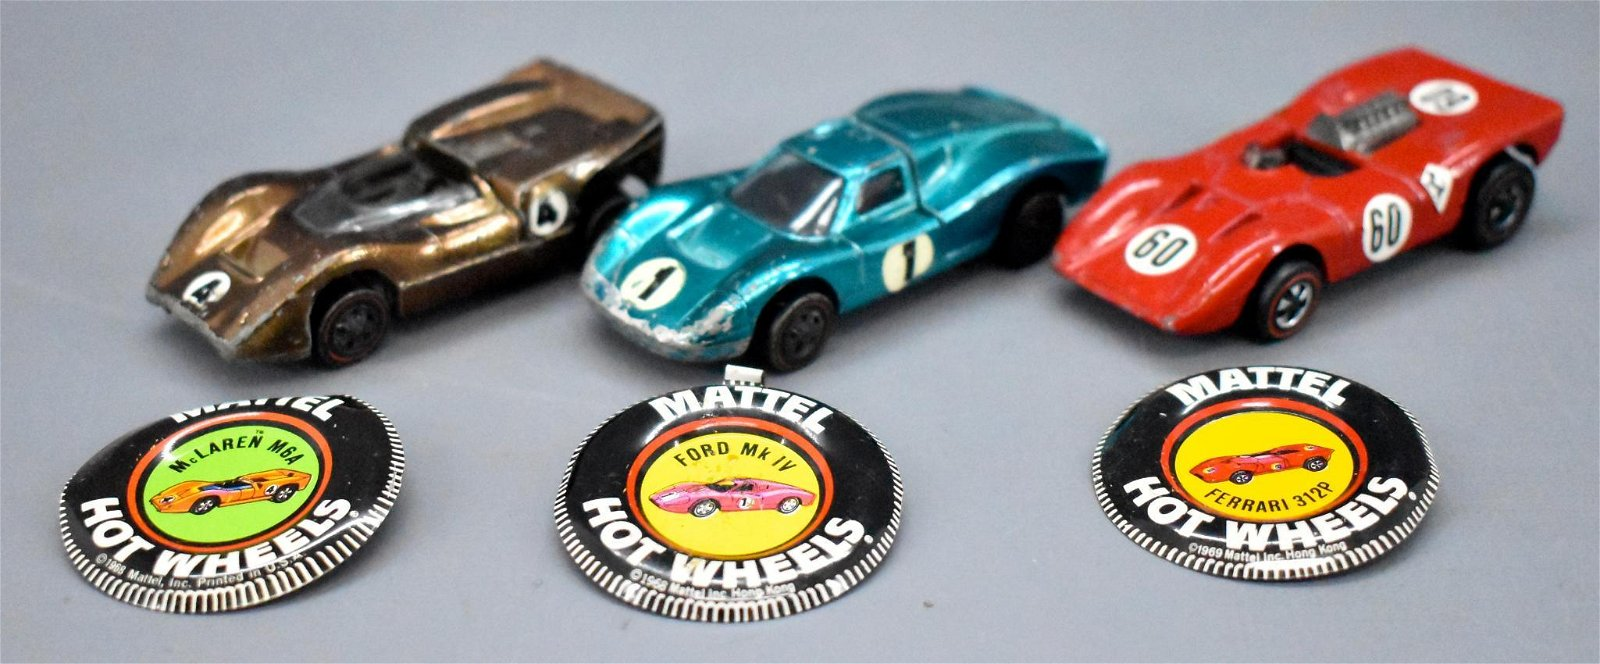 Three Redline Hot Wheels European race cars with